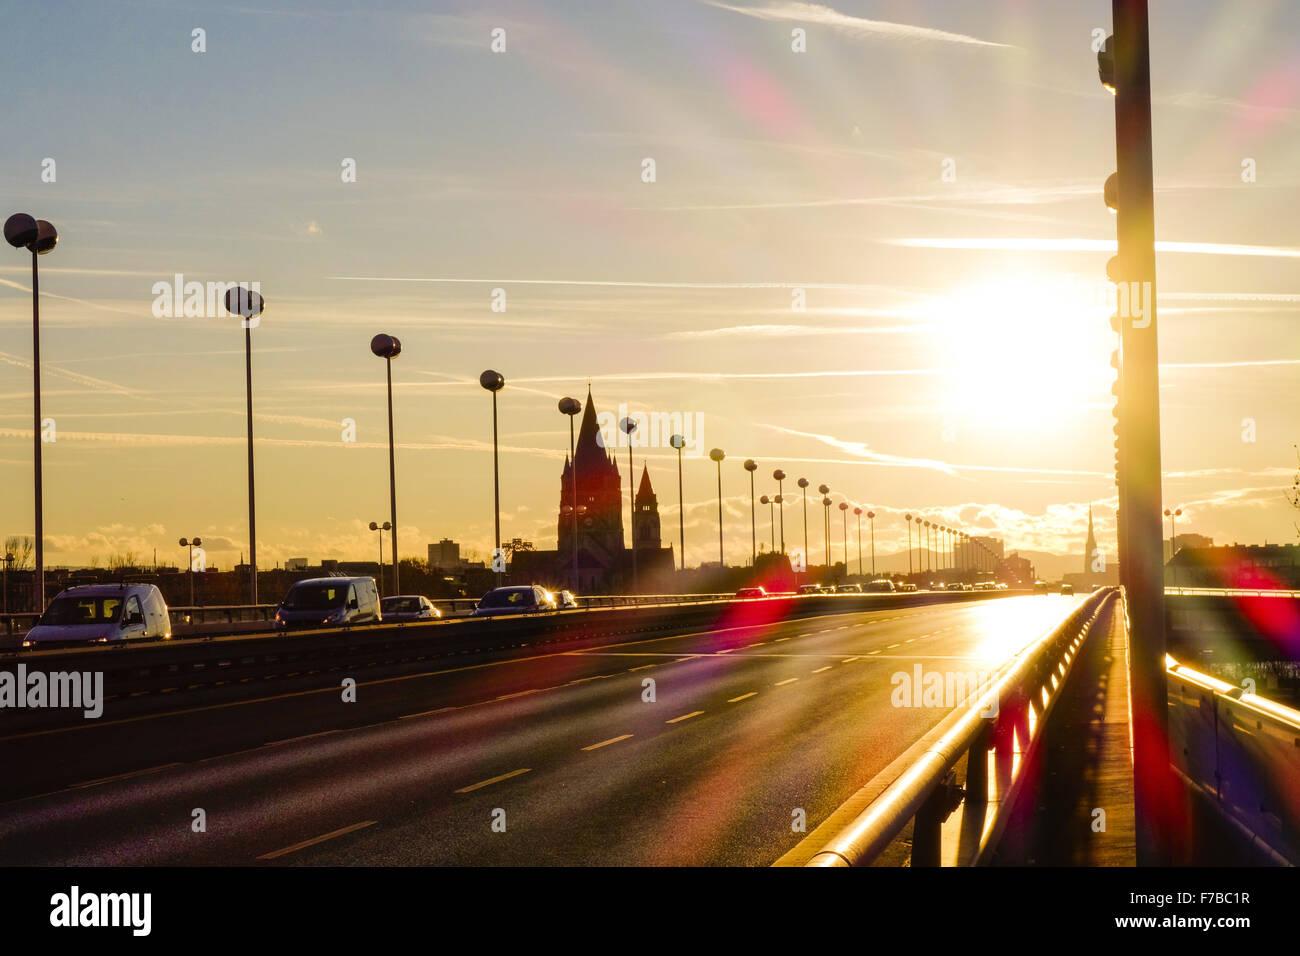 Vienna, Franz von Assisi Chiesa, Mexikoplatz, Ponte Reichsbruecke, Austria, 2. distretto Immagini Stock